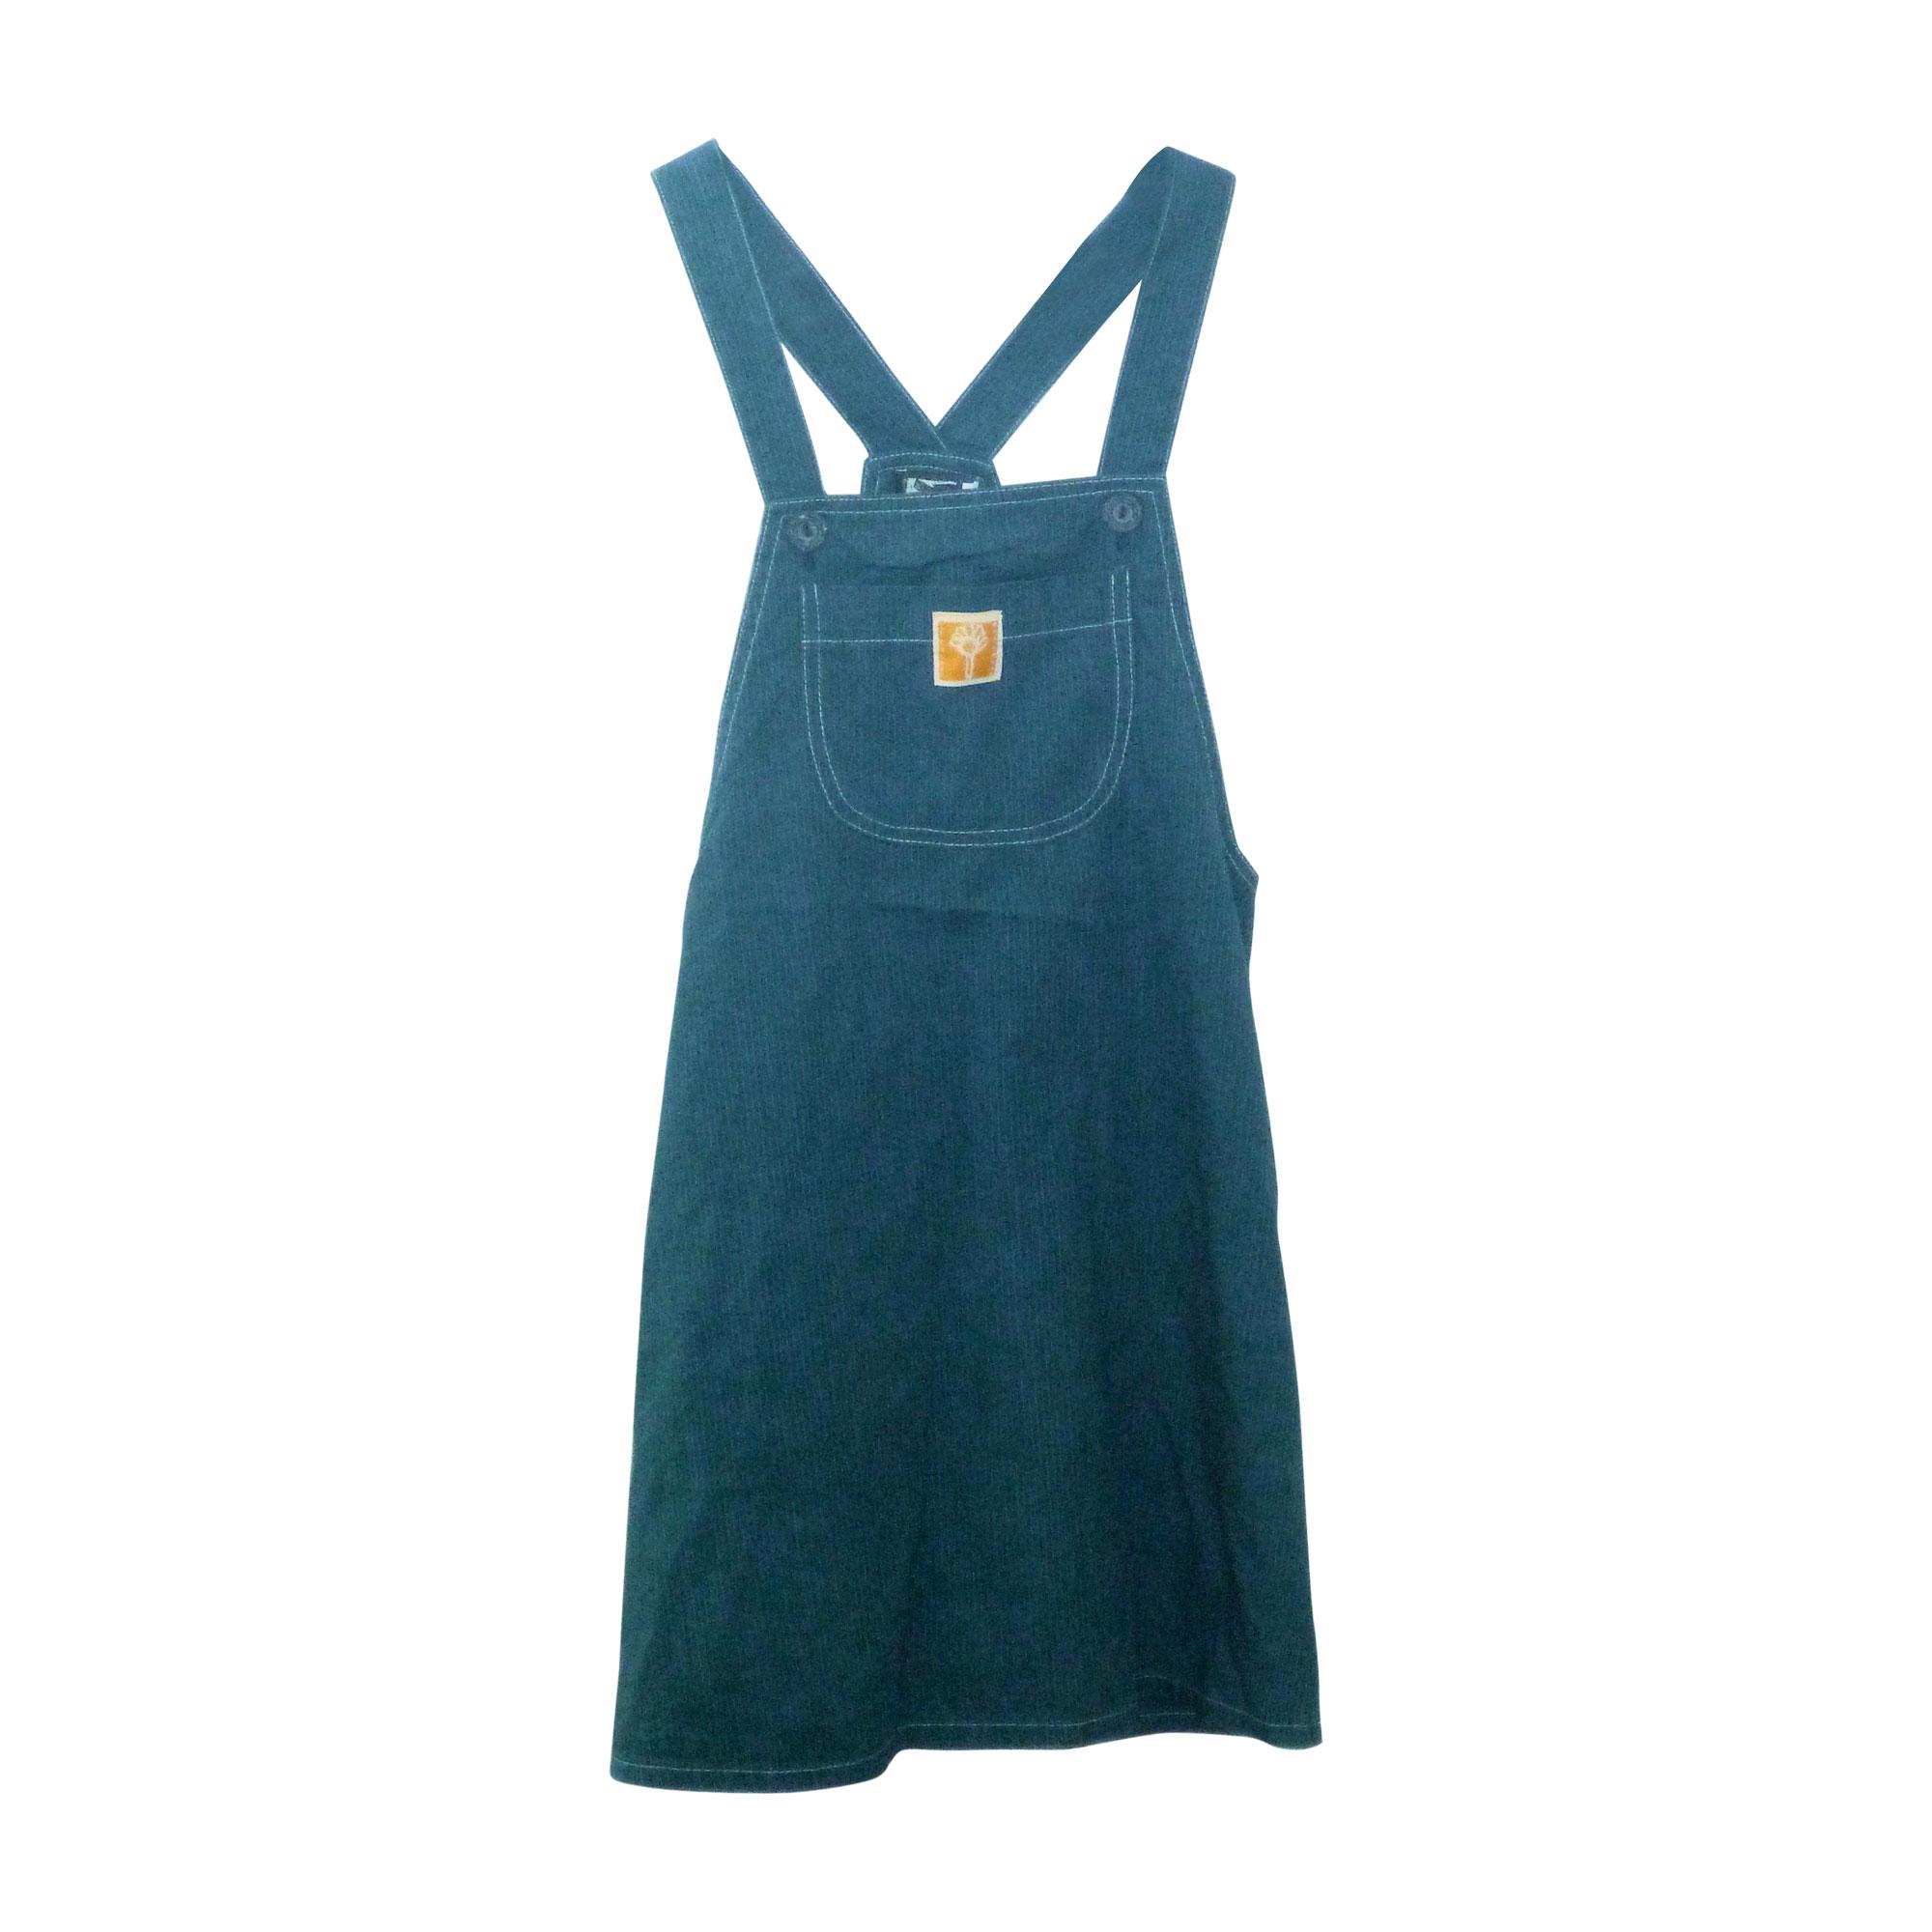 7b72d551dcdf9 Robe JEAN BOURGET 7-8 ans bleu vendu par K a95779 - 2477478